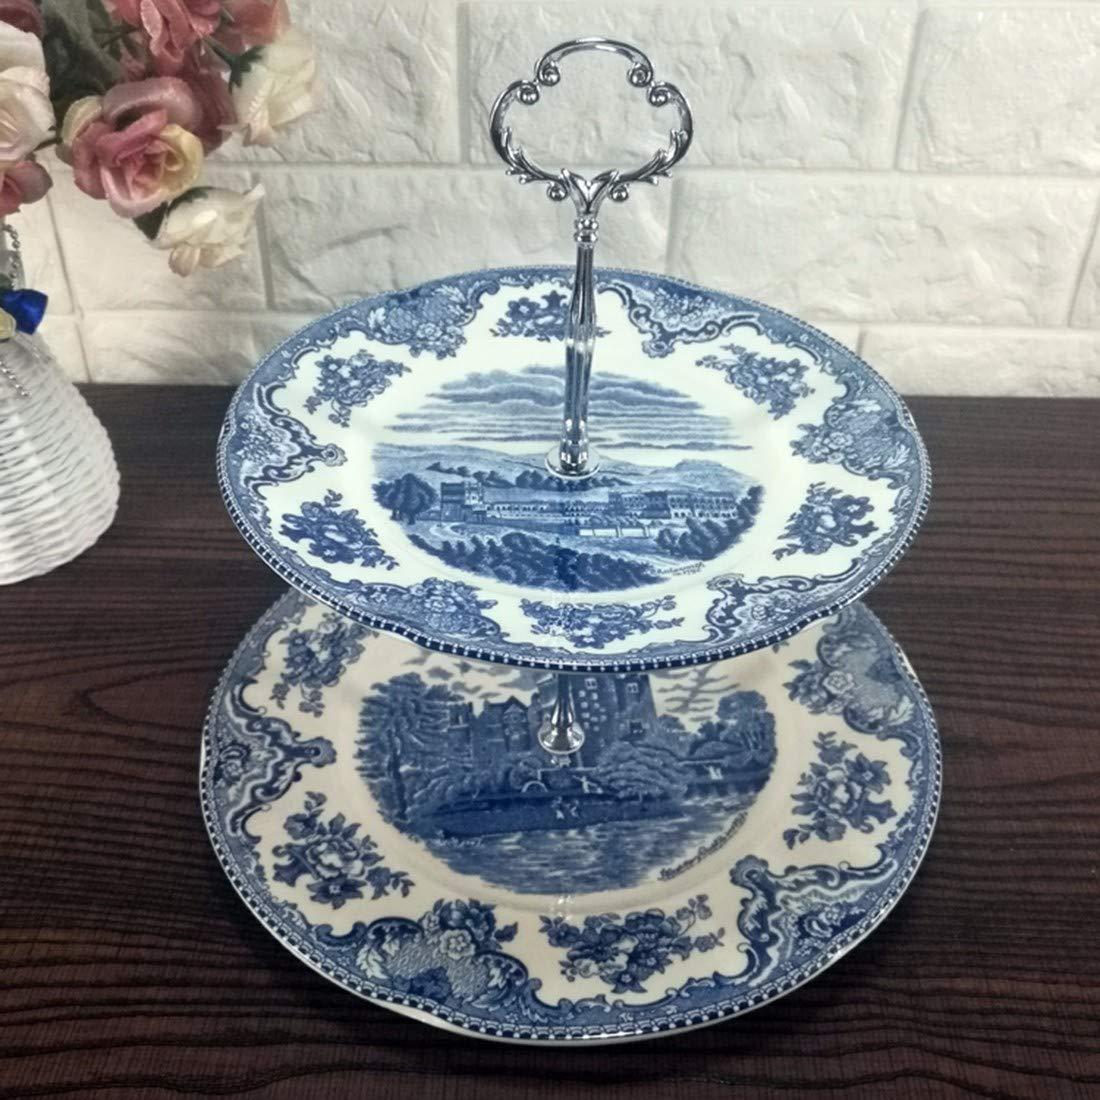 QPGGP-Teller Blaue Schloss Keramik, westlichen Stil Steak, Platten, kaffeetassen, Dekorationen, Platten,m